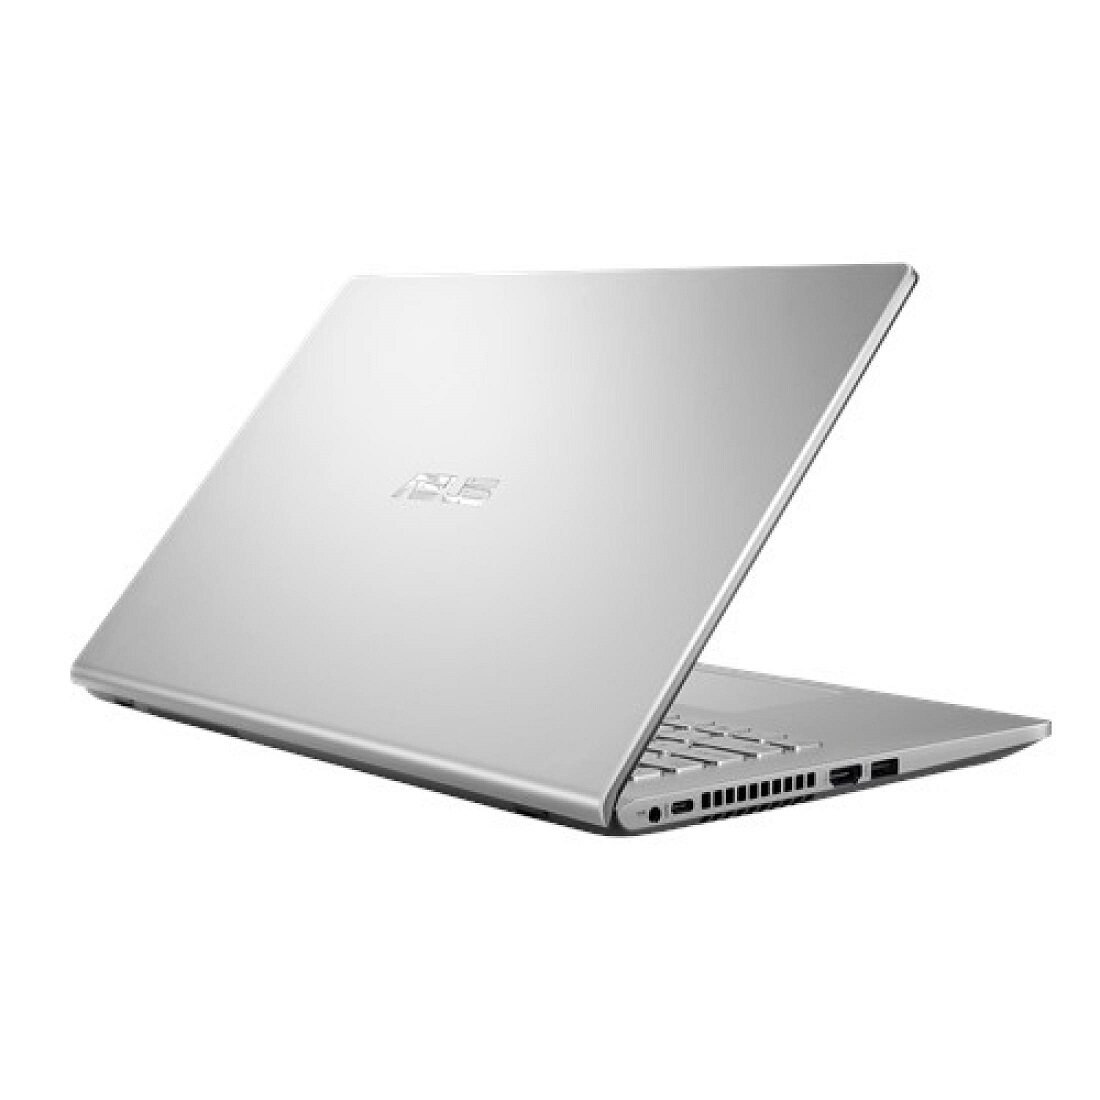 ASUS A416M-AEB093T LAPTOP SILVER CELERON N4020, 4GB, 256GB SSD, 14